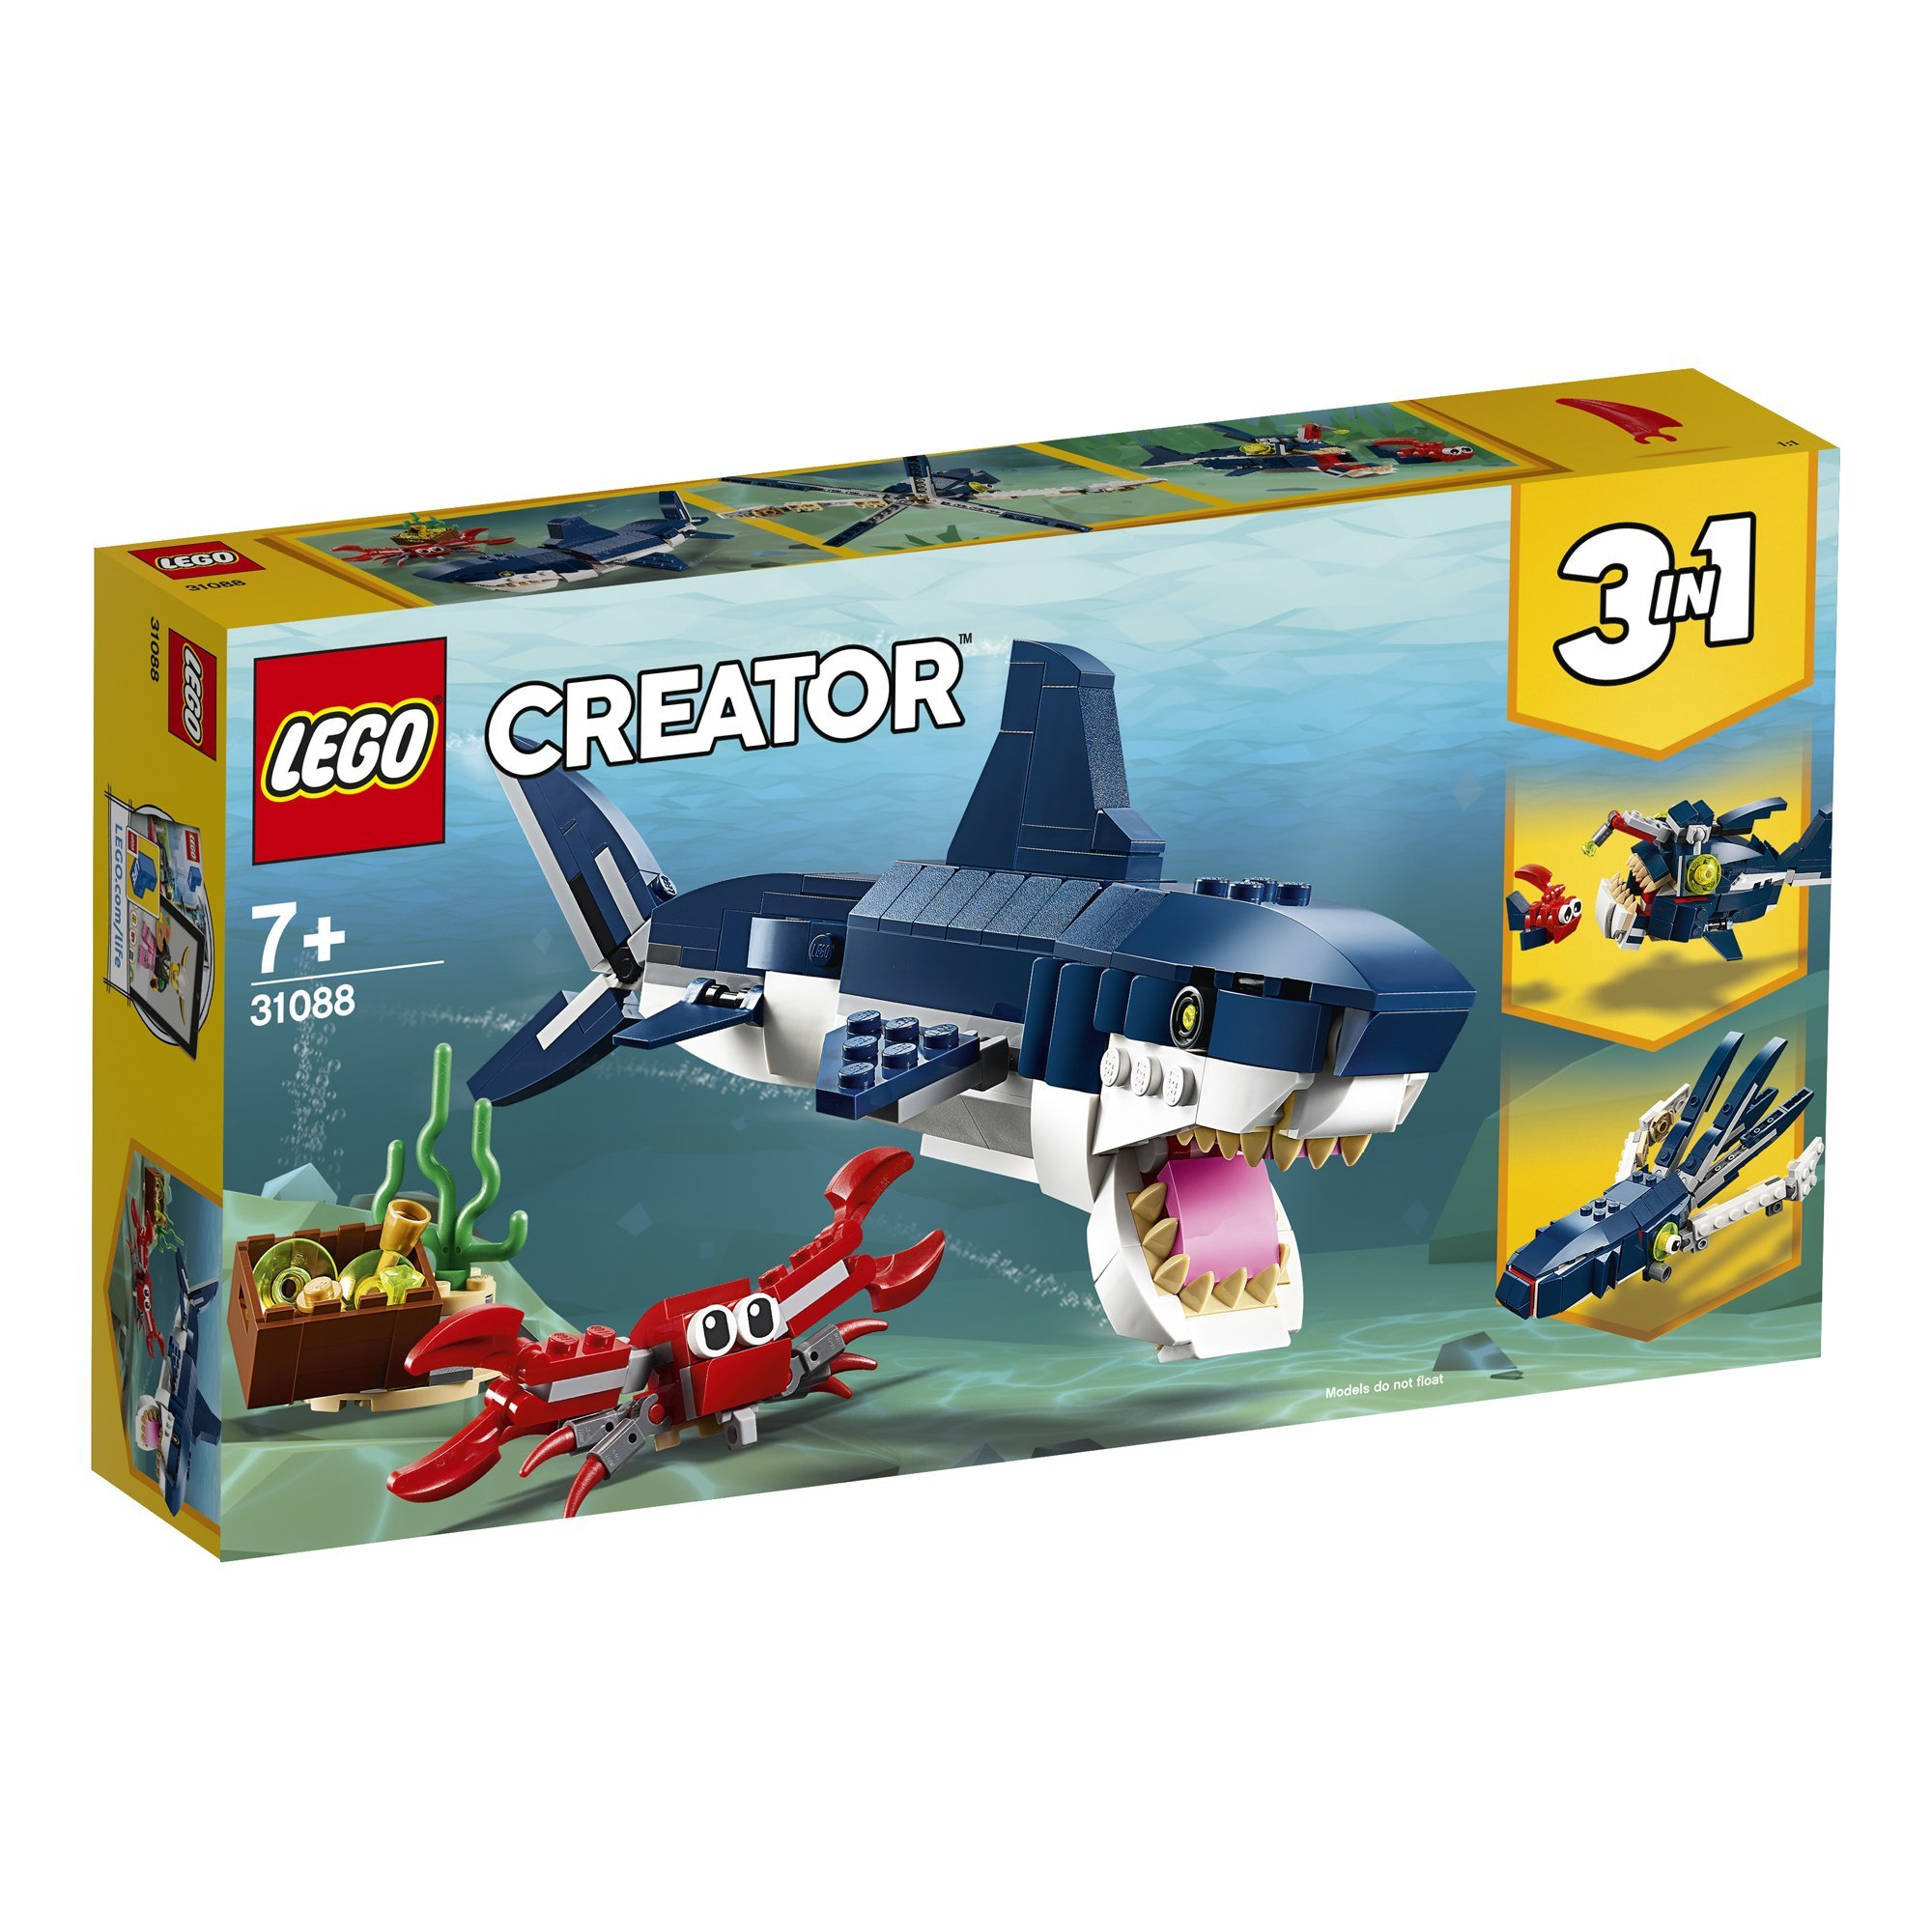 LEGO 樂高積木 Creator系列 31088 深海生物